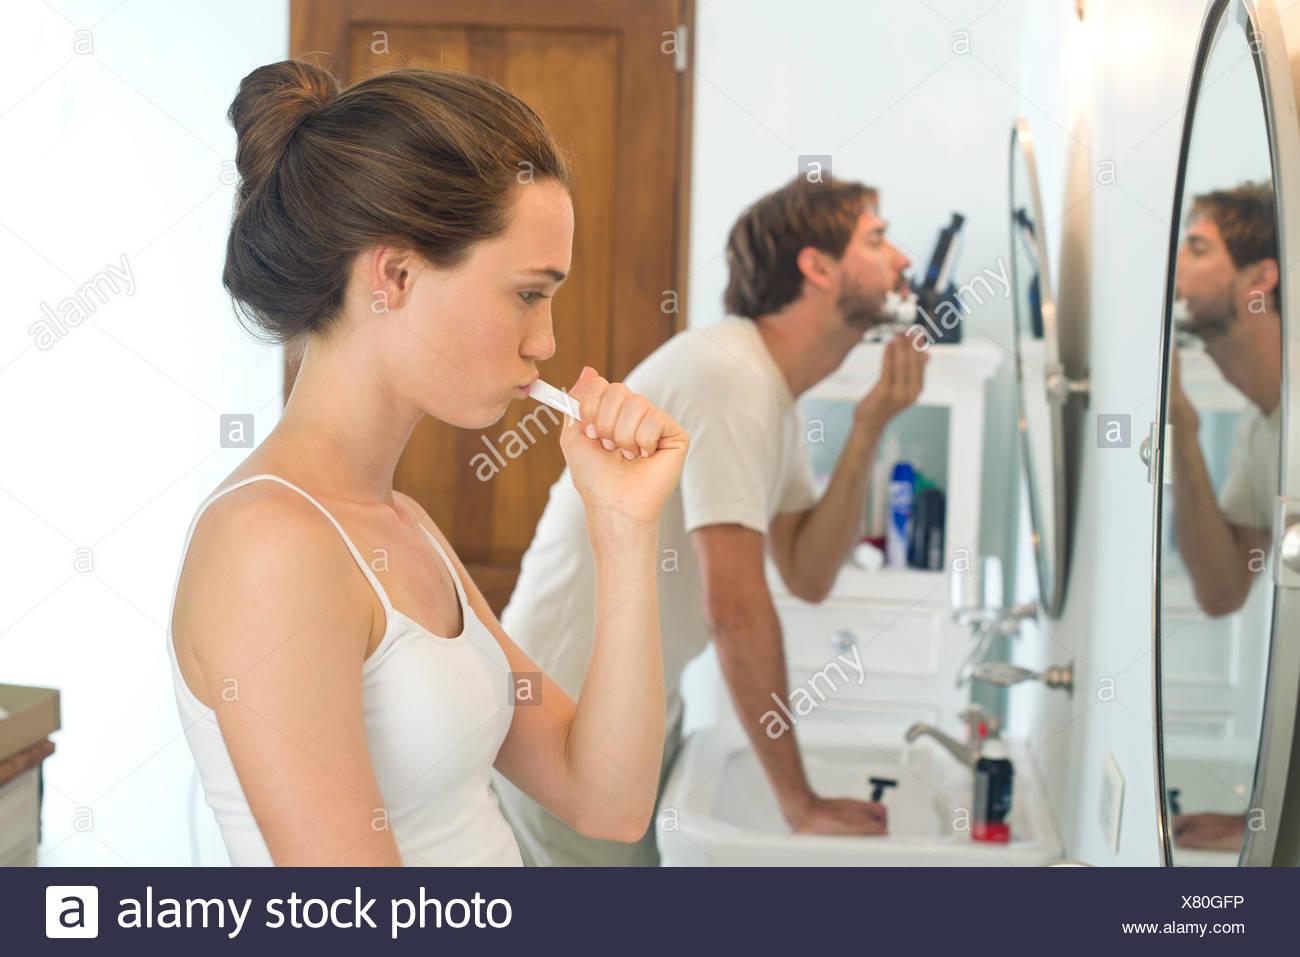 Woman brushing teeth, husband shaving - Stock Image